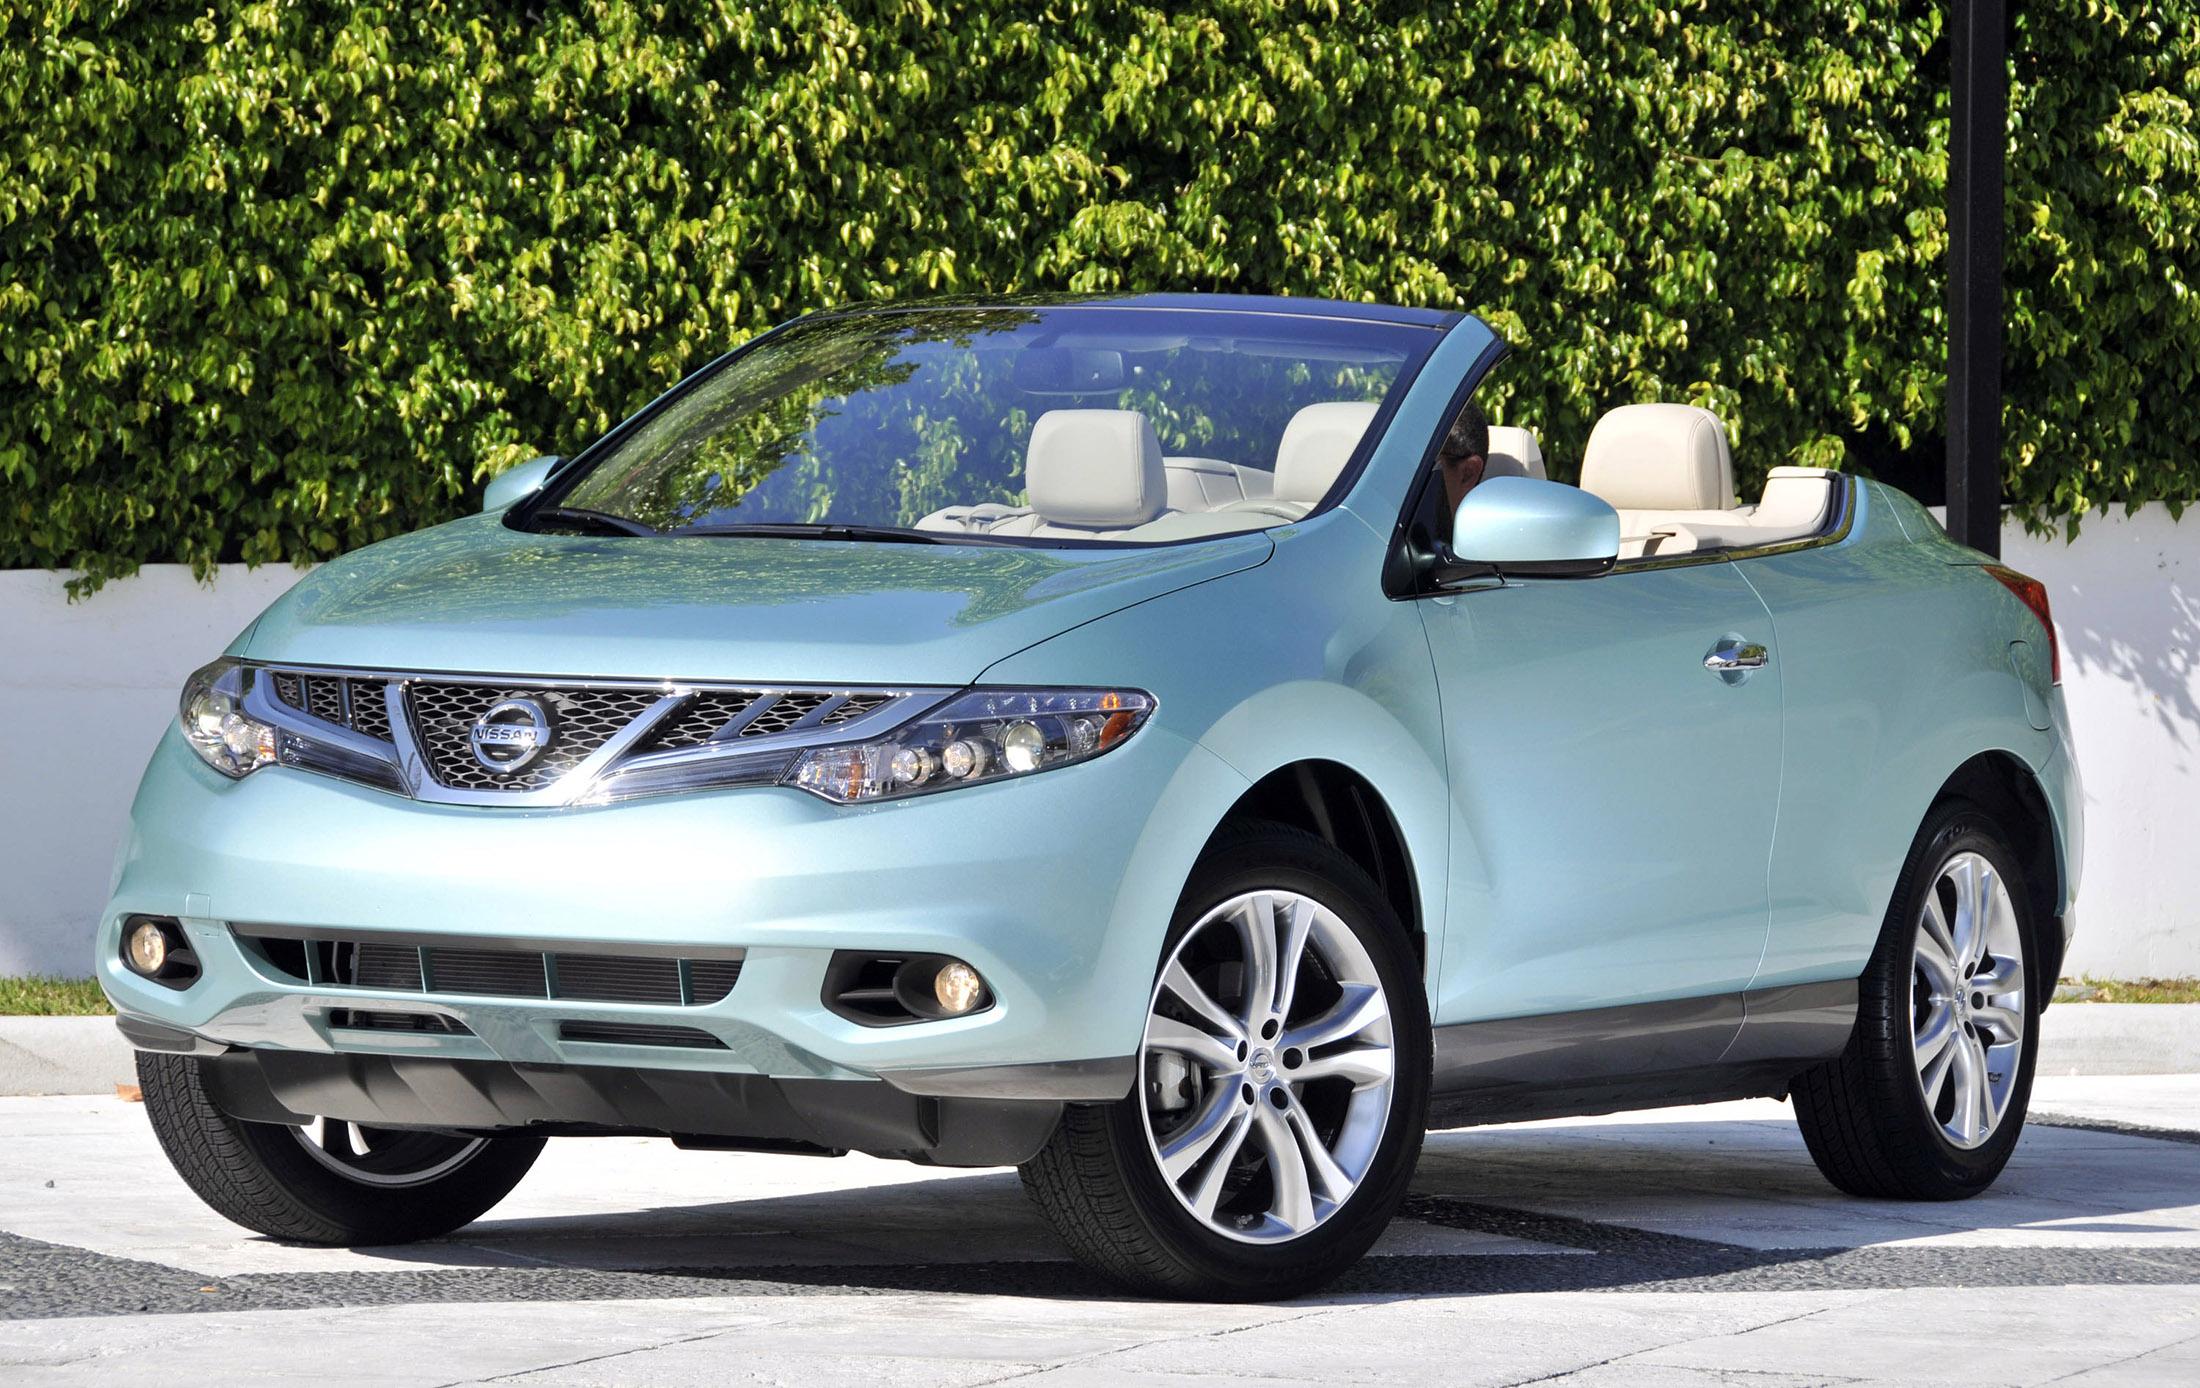 Nissan Murano CrossCabriolet 2010